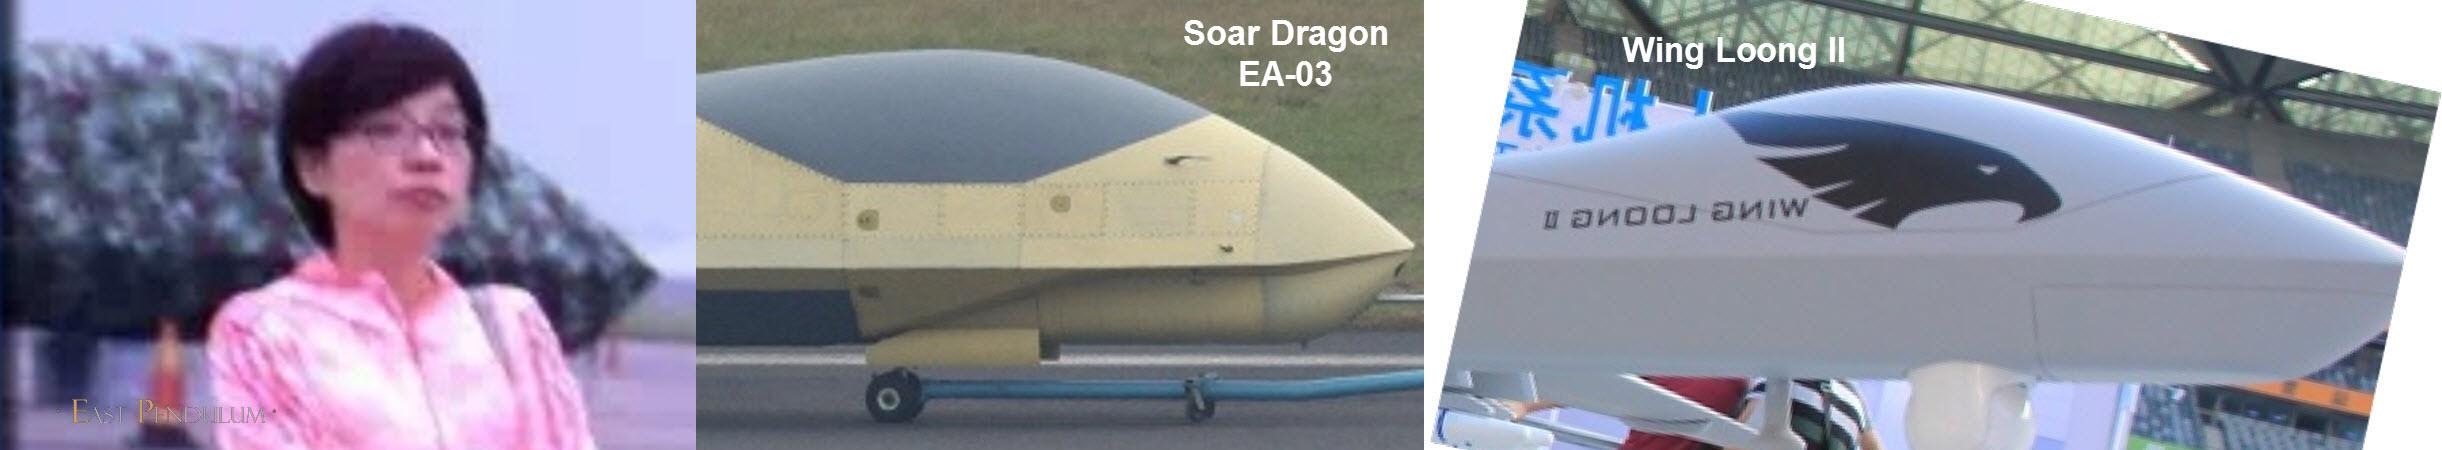 2016-09-09-quand-un-harrier-cache-un-dragon-46